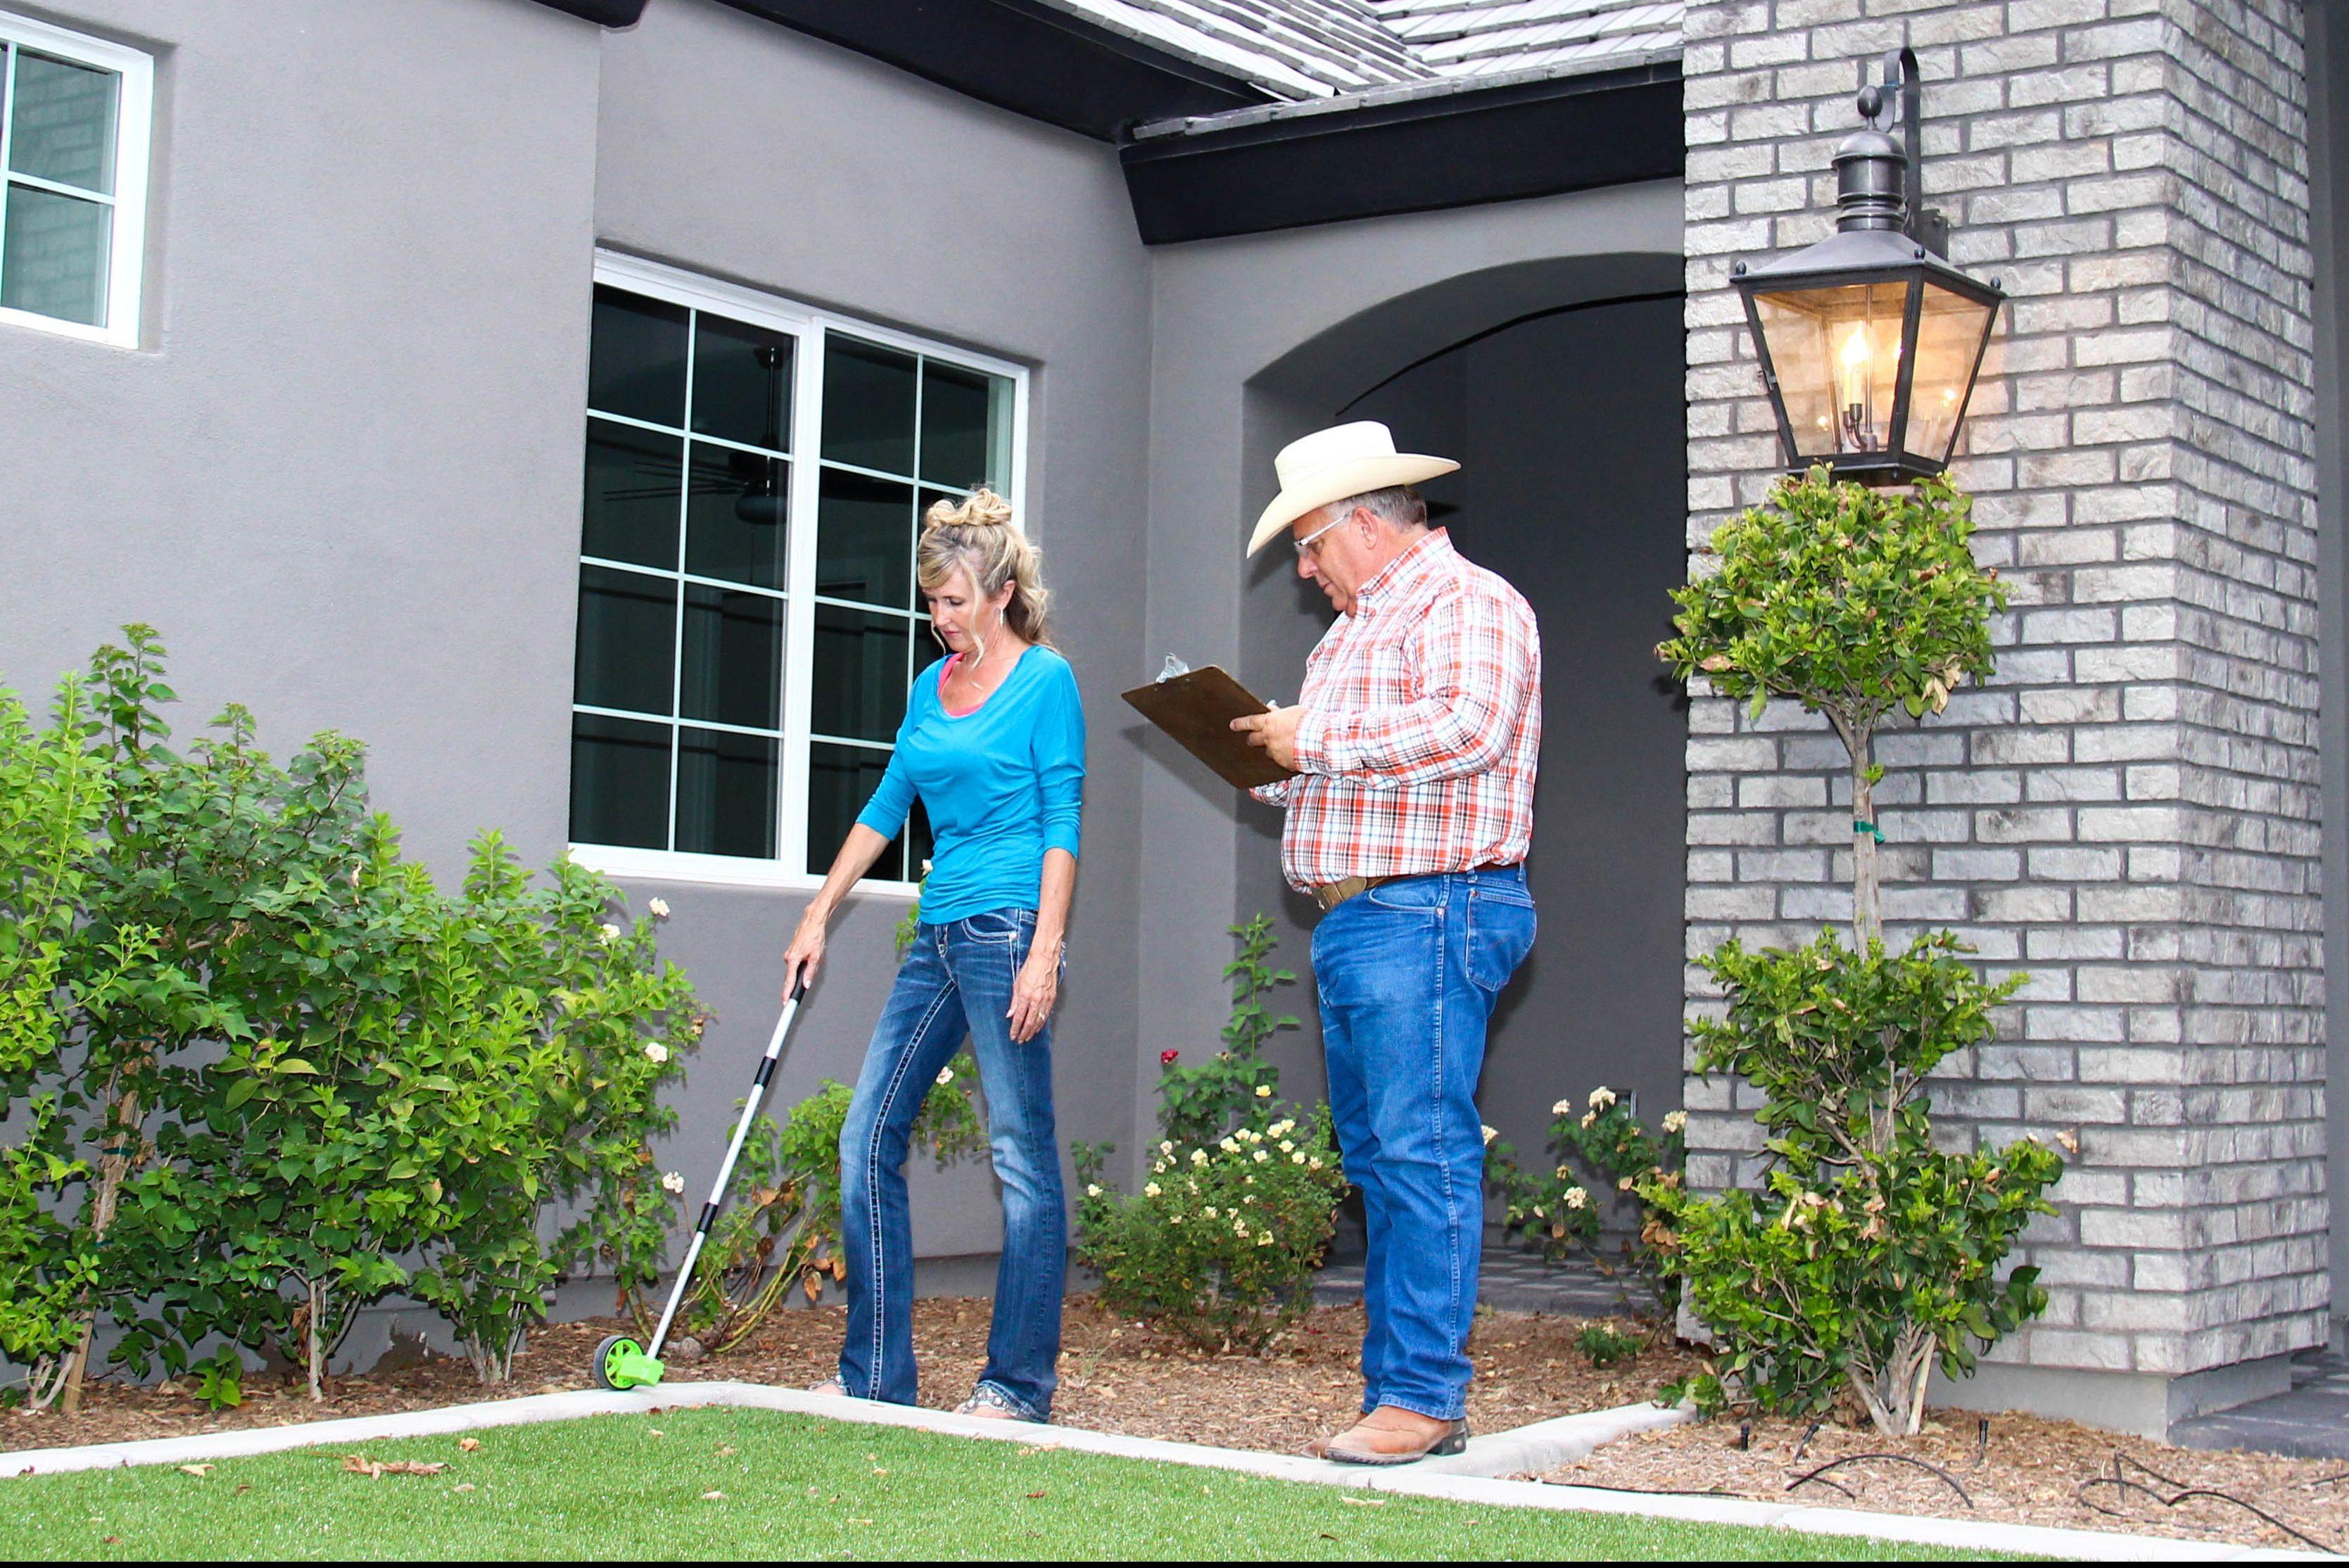 Johnson Appraisal Group - Real Estate Appraisal